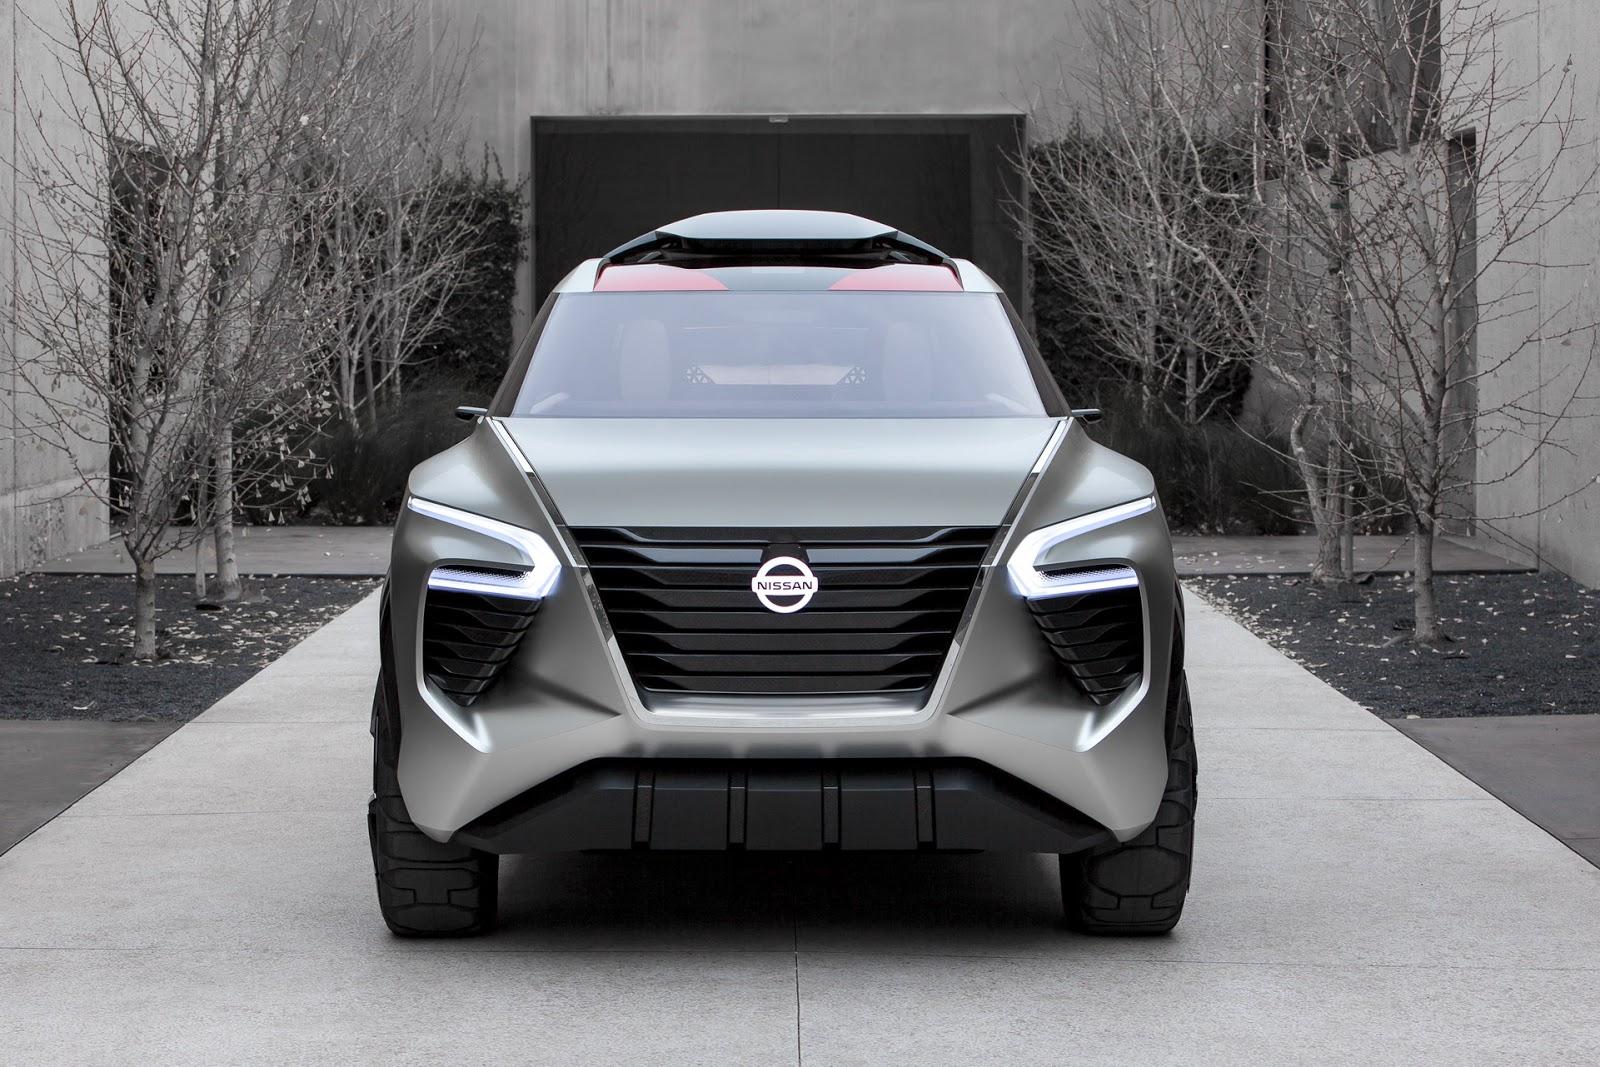 Nissan-Xmotion-Concept-33.jpg